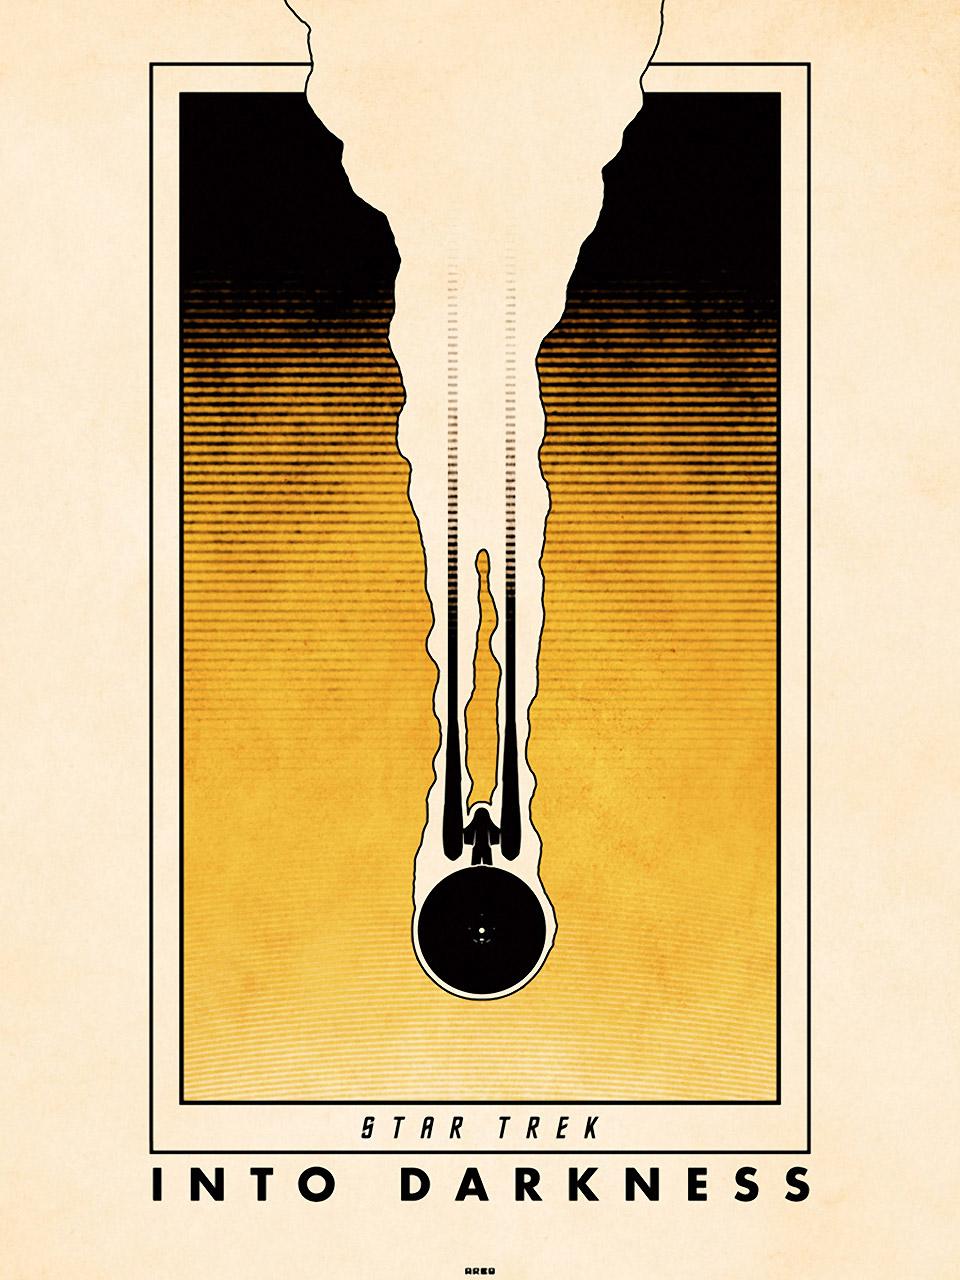 Star Trek Into Darkness Posters by Matt Ferguson